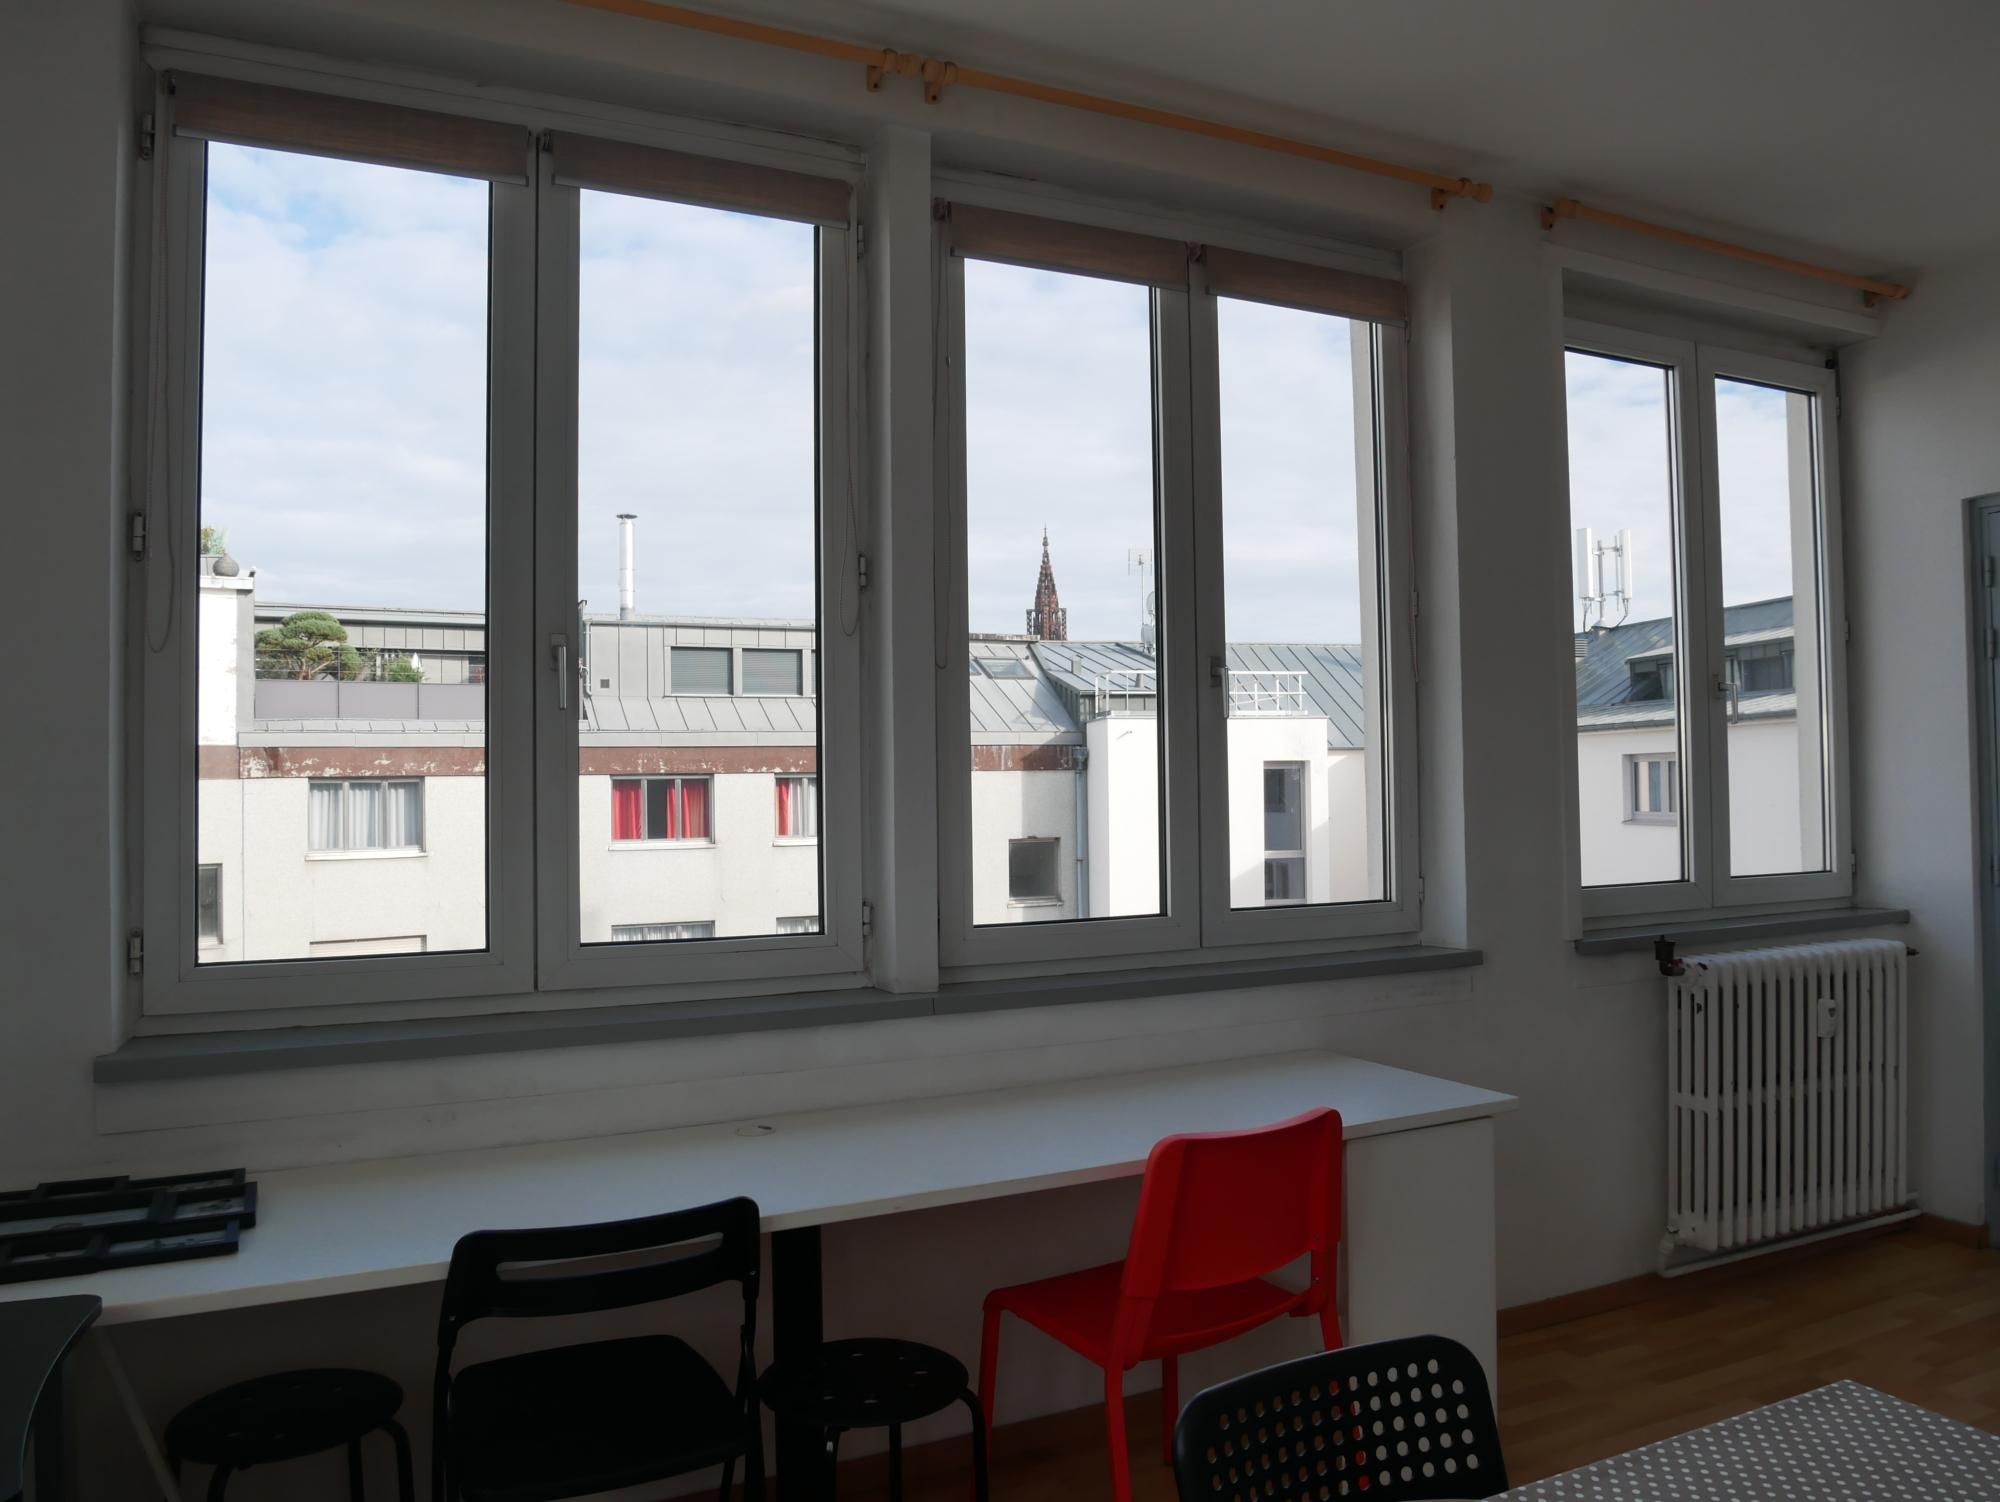 Superbe 2P meublé en duplex - Centre / Rue du 22 Novembre - nos locations - Beausite Immobilier 2